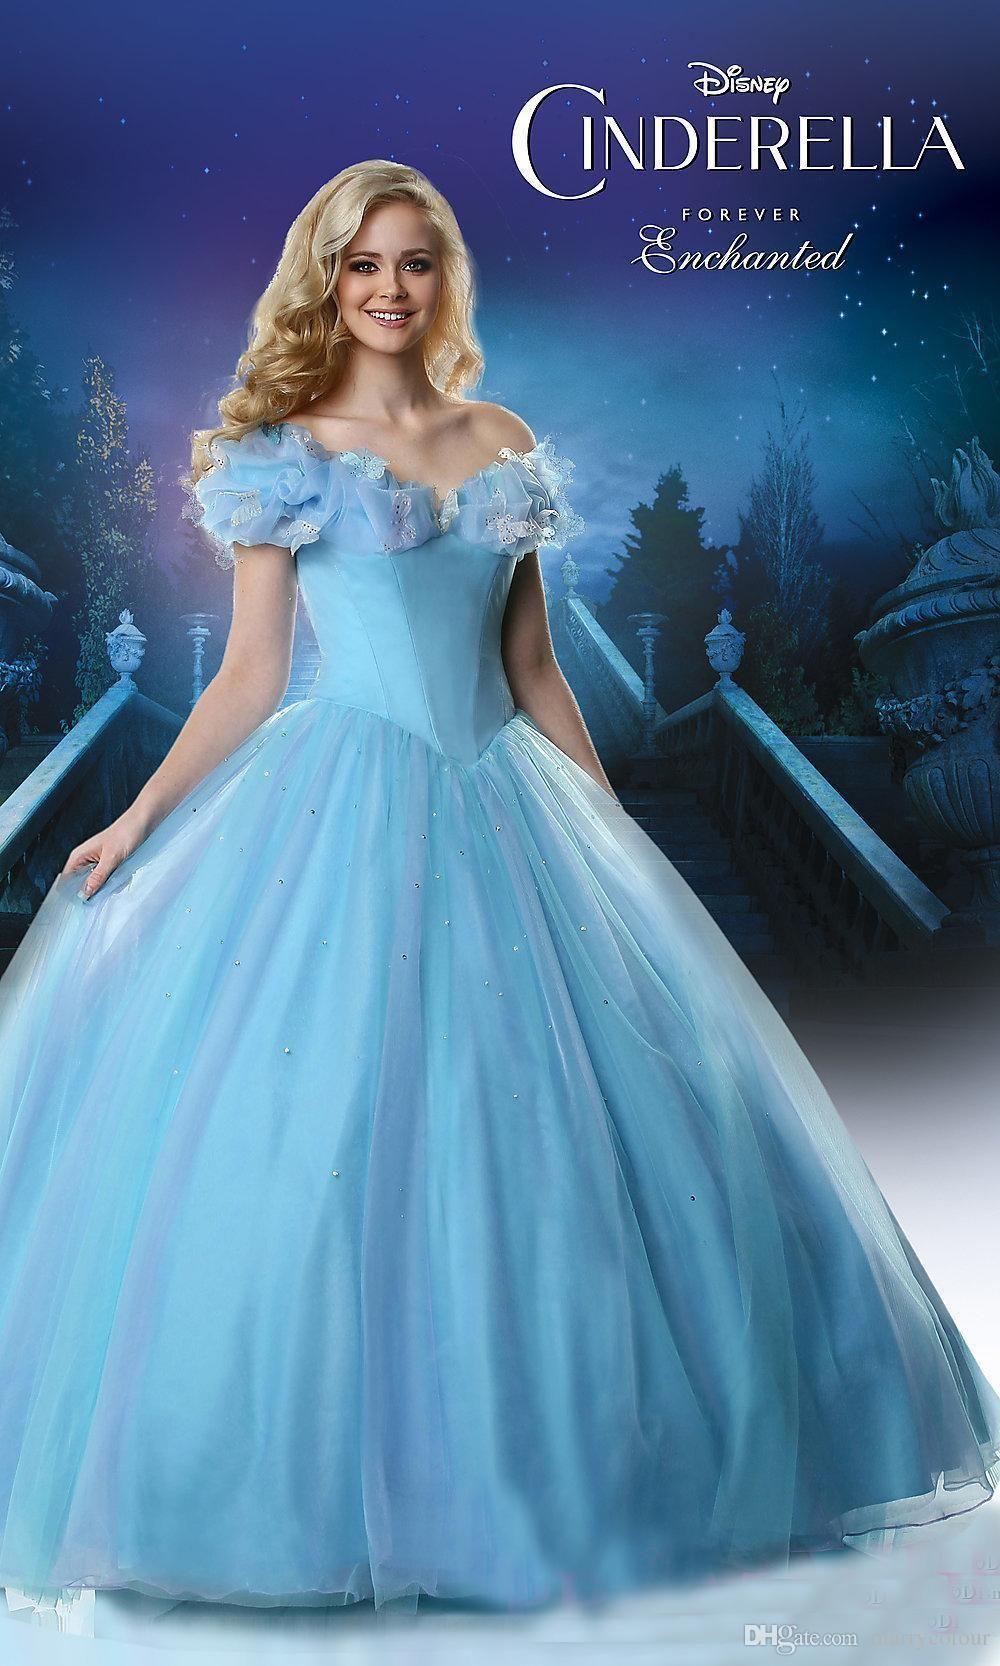 blue floral wedding dresses - Google Search | Disney Princess ...